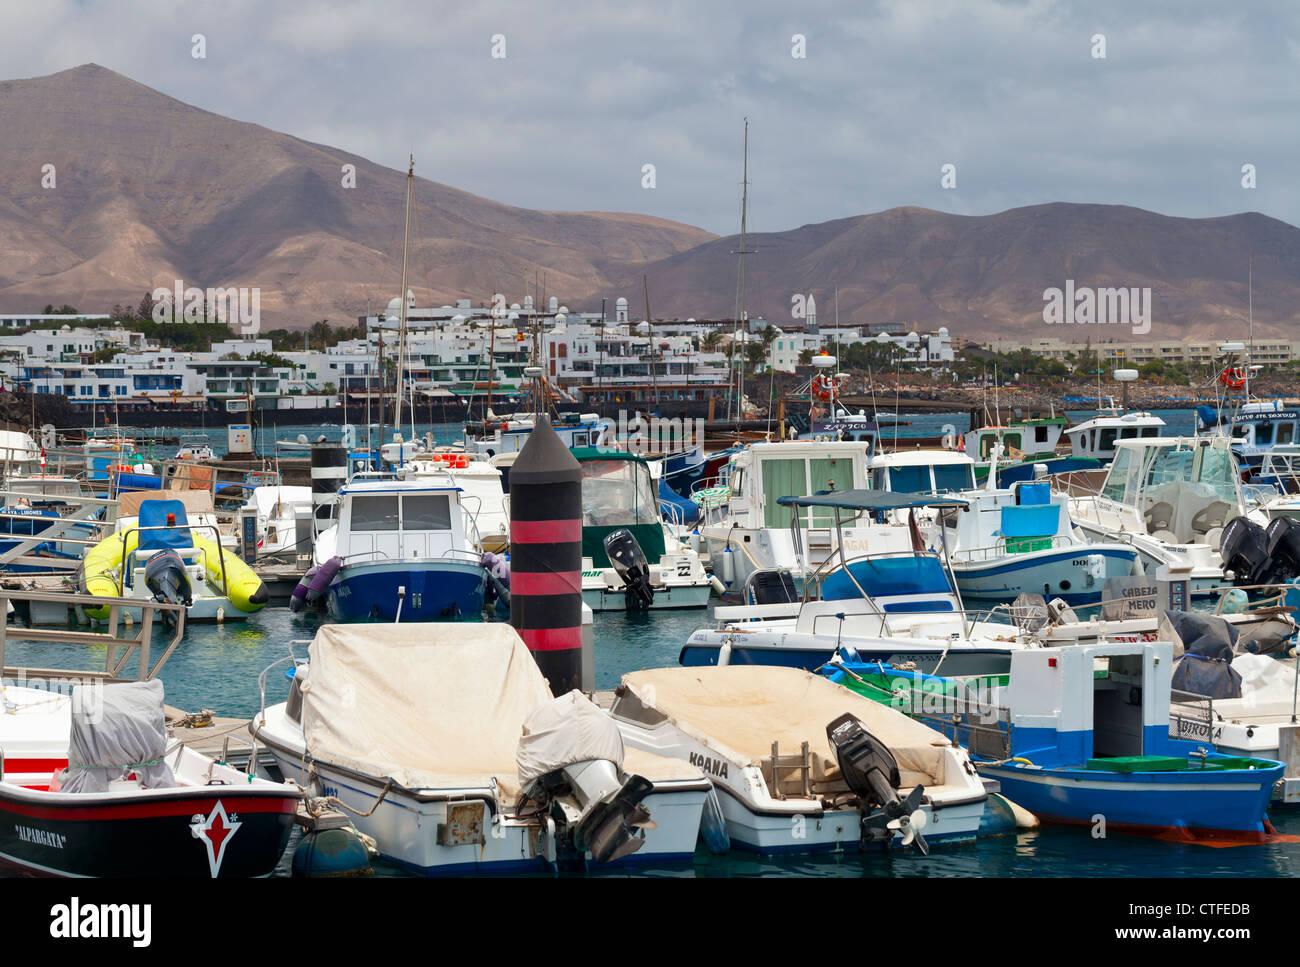 Playa Blanca harbour - Playa Blanca, Lanzarote, Canary Islands, Spain, Europe - Stock Image